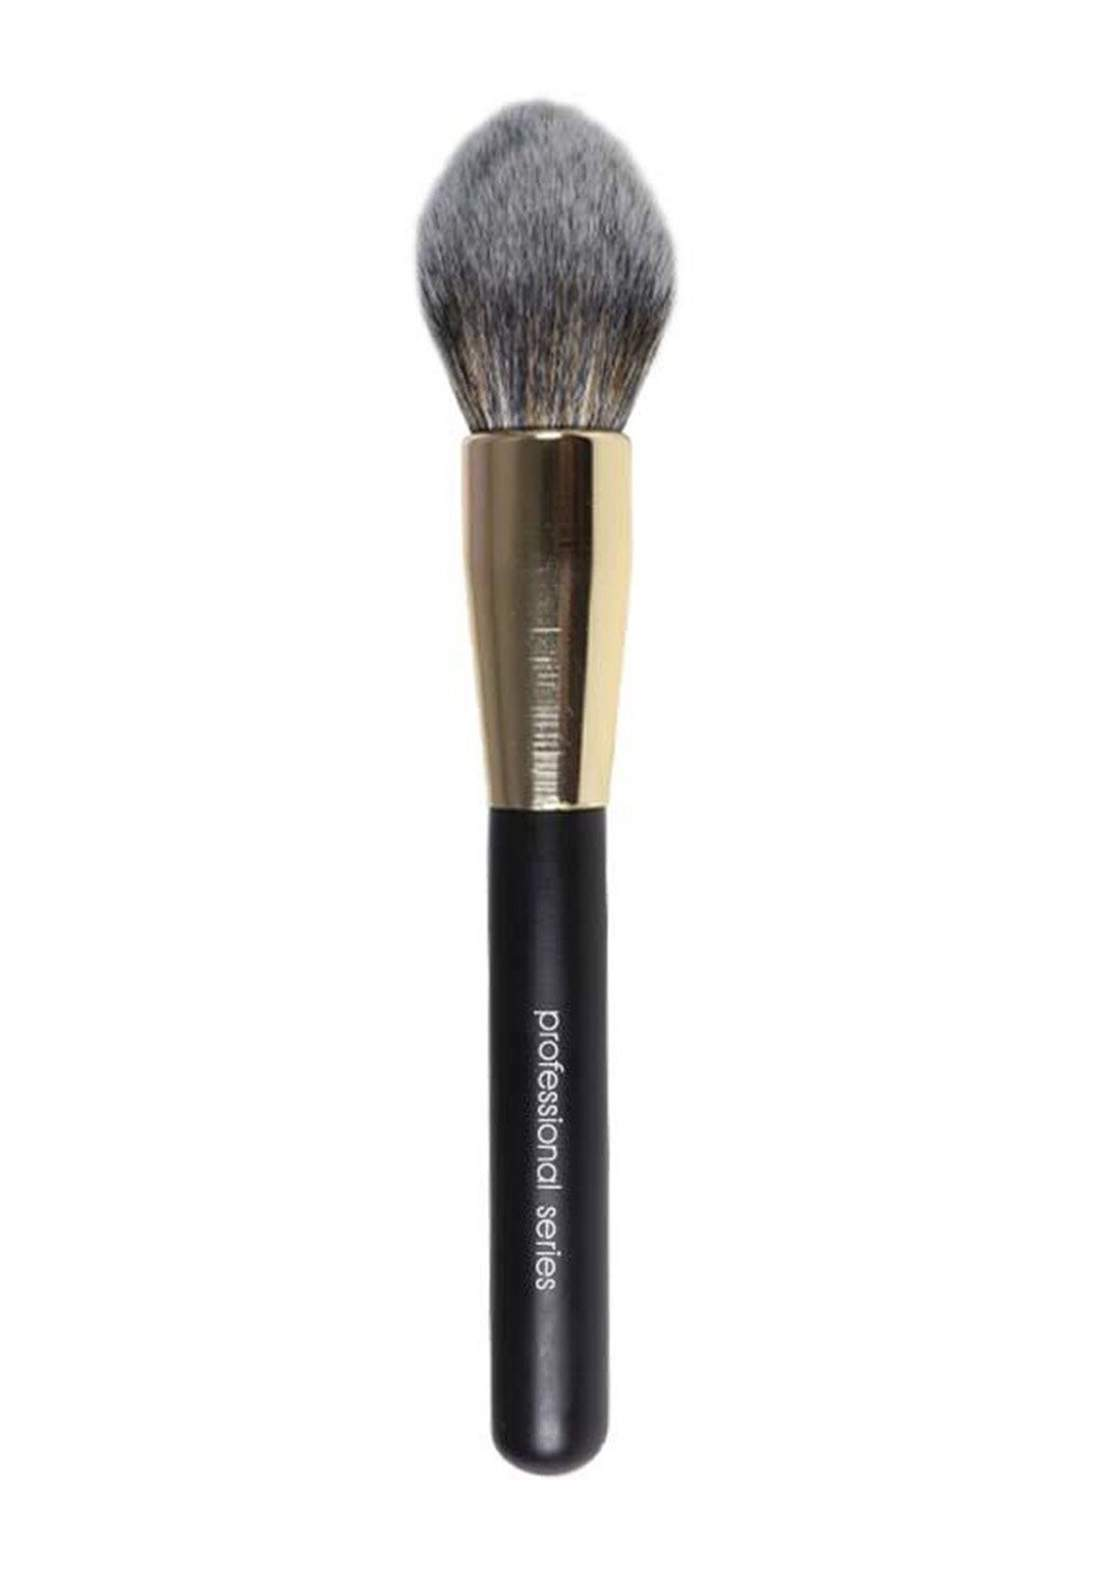 Nascita 0112 Professional Oval Powder Brush فرشاة باودر